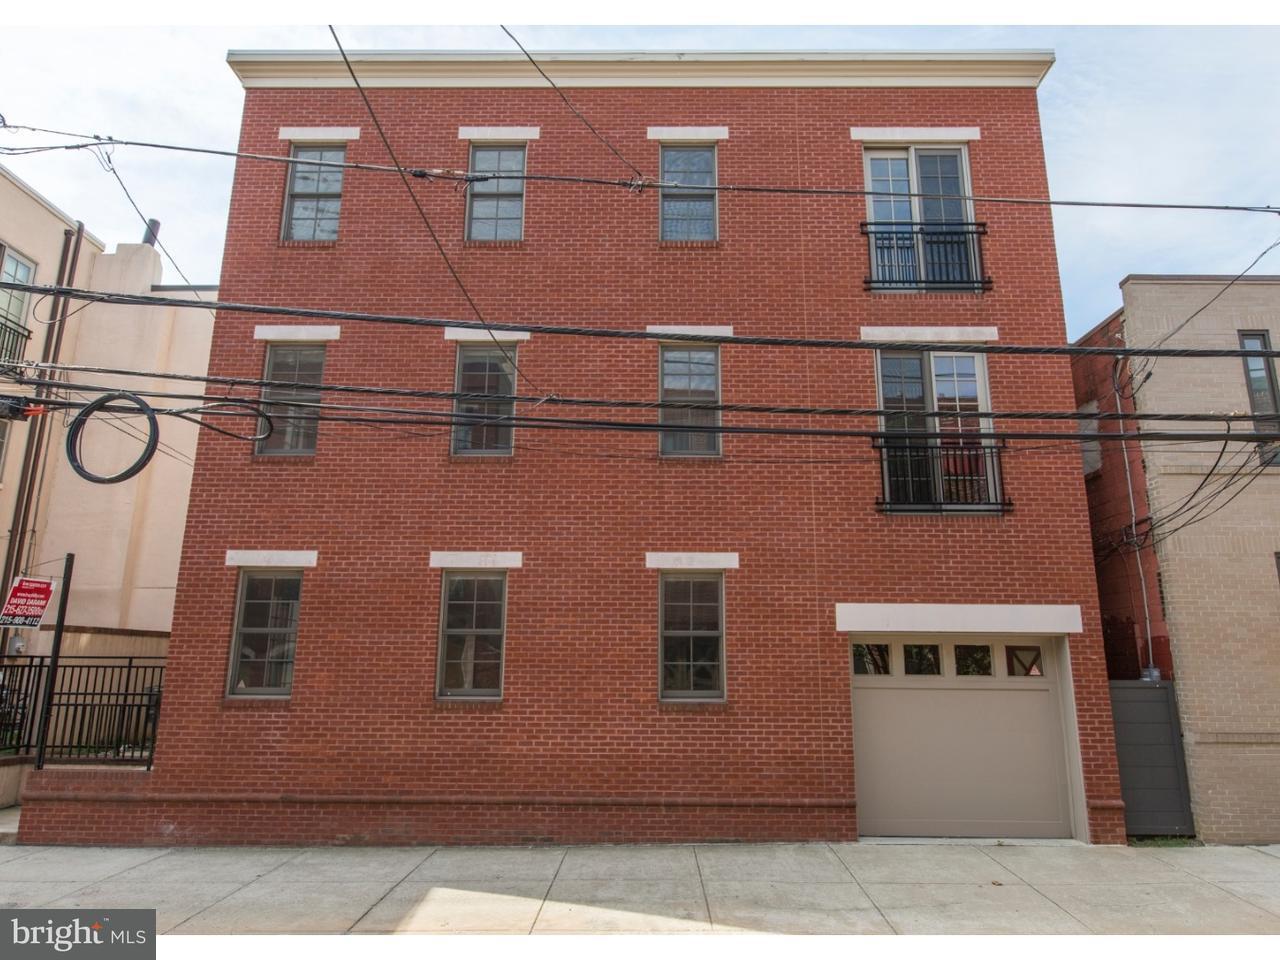 1702  North Philadelphia, PA 19130